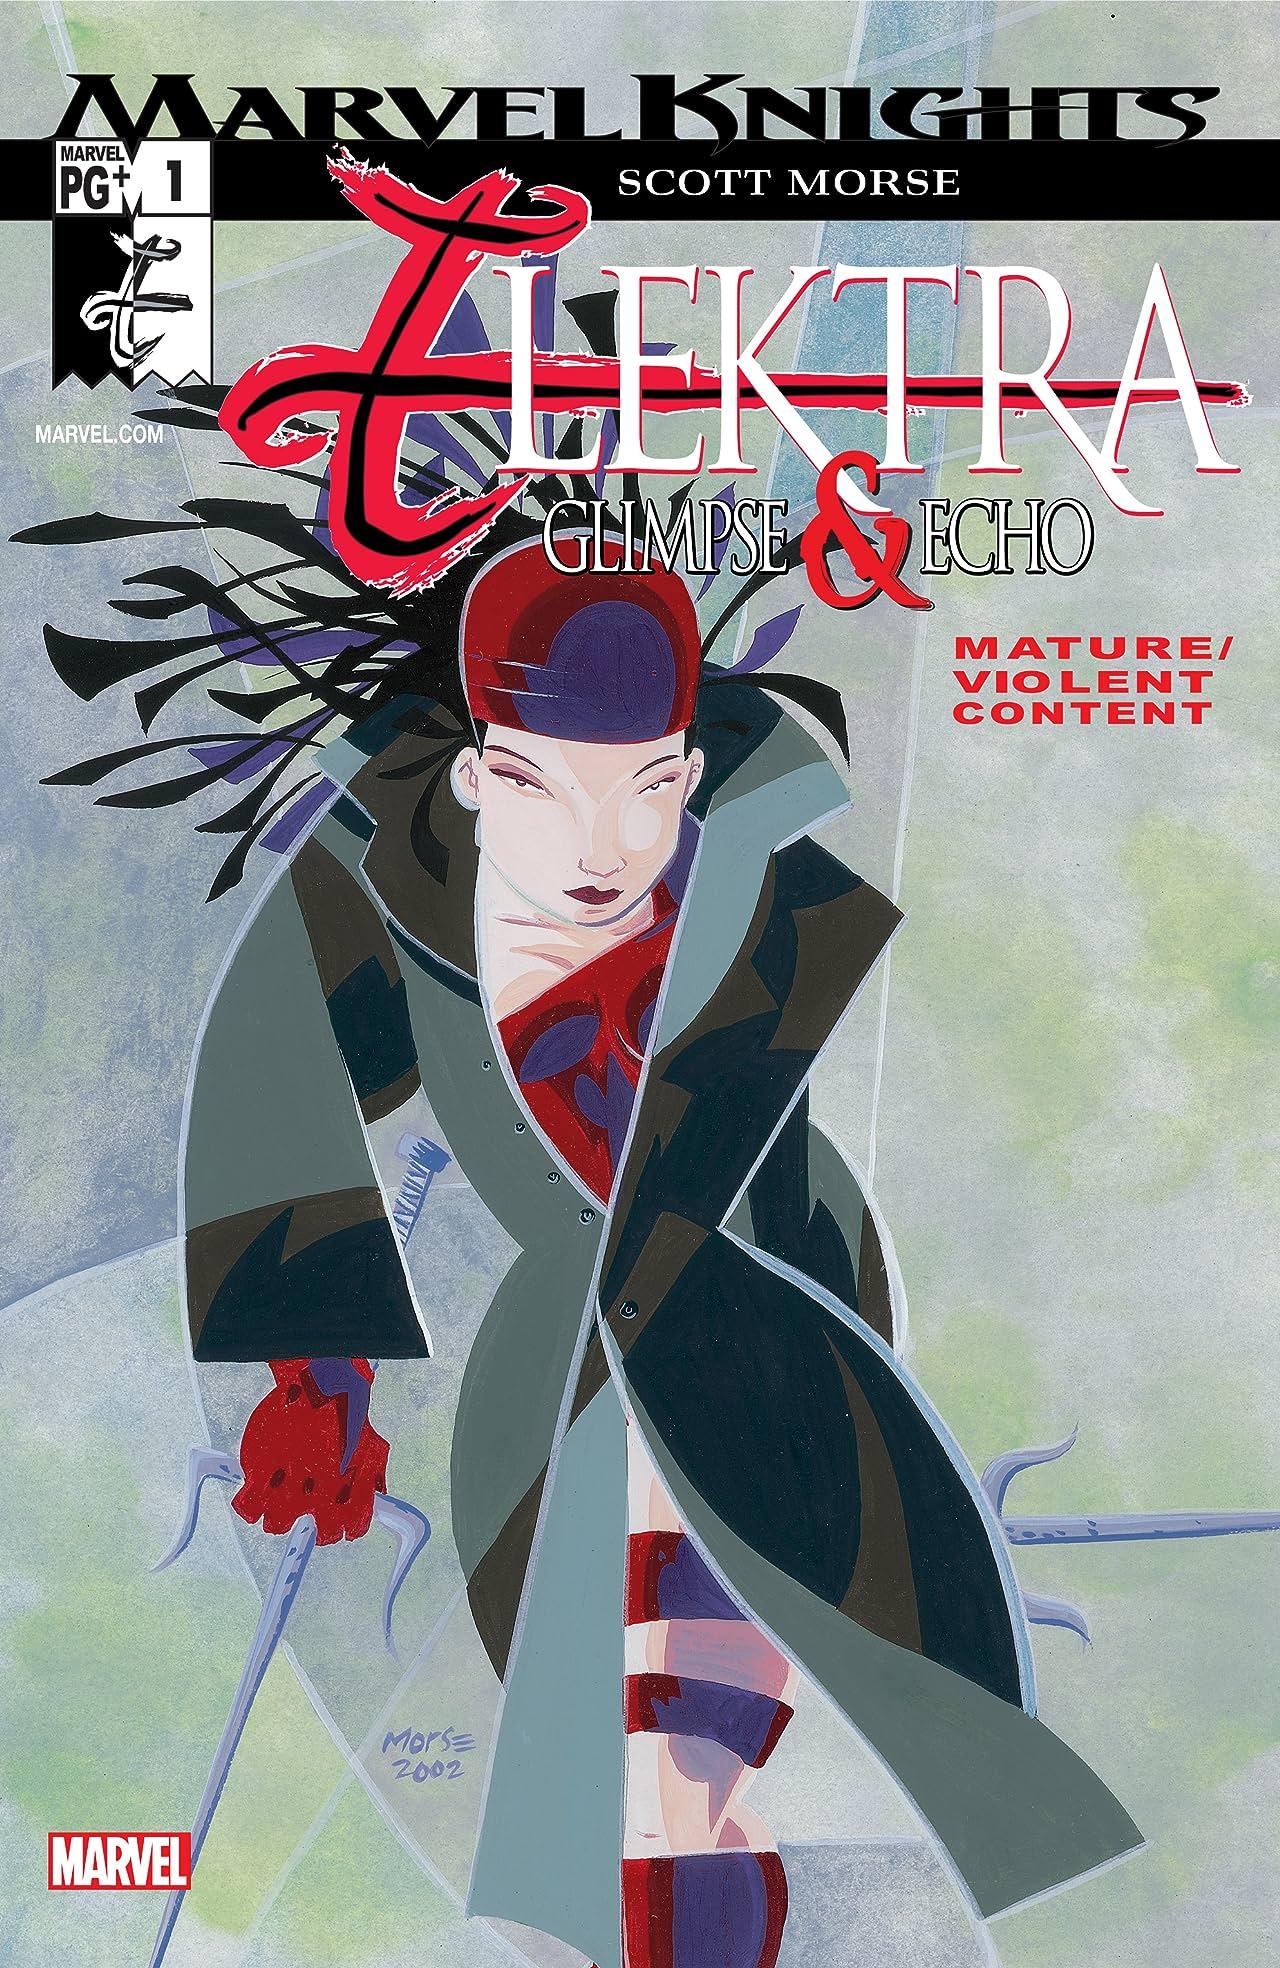 Elektra: Glimpse and Echo (2002) #1